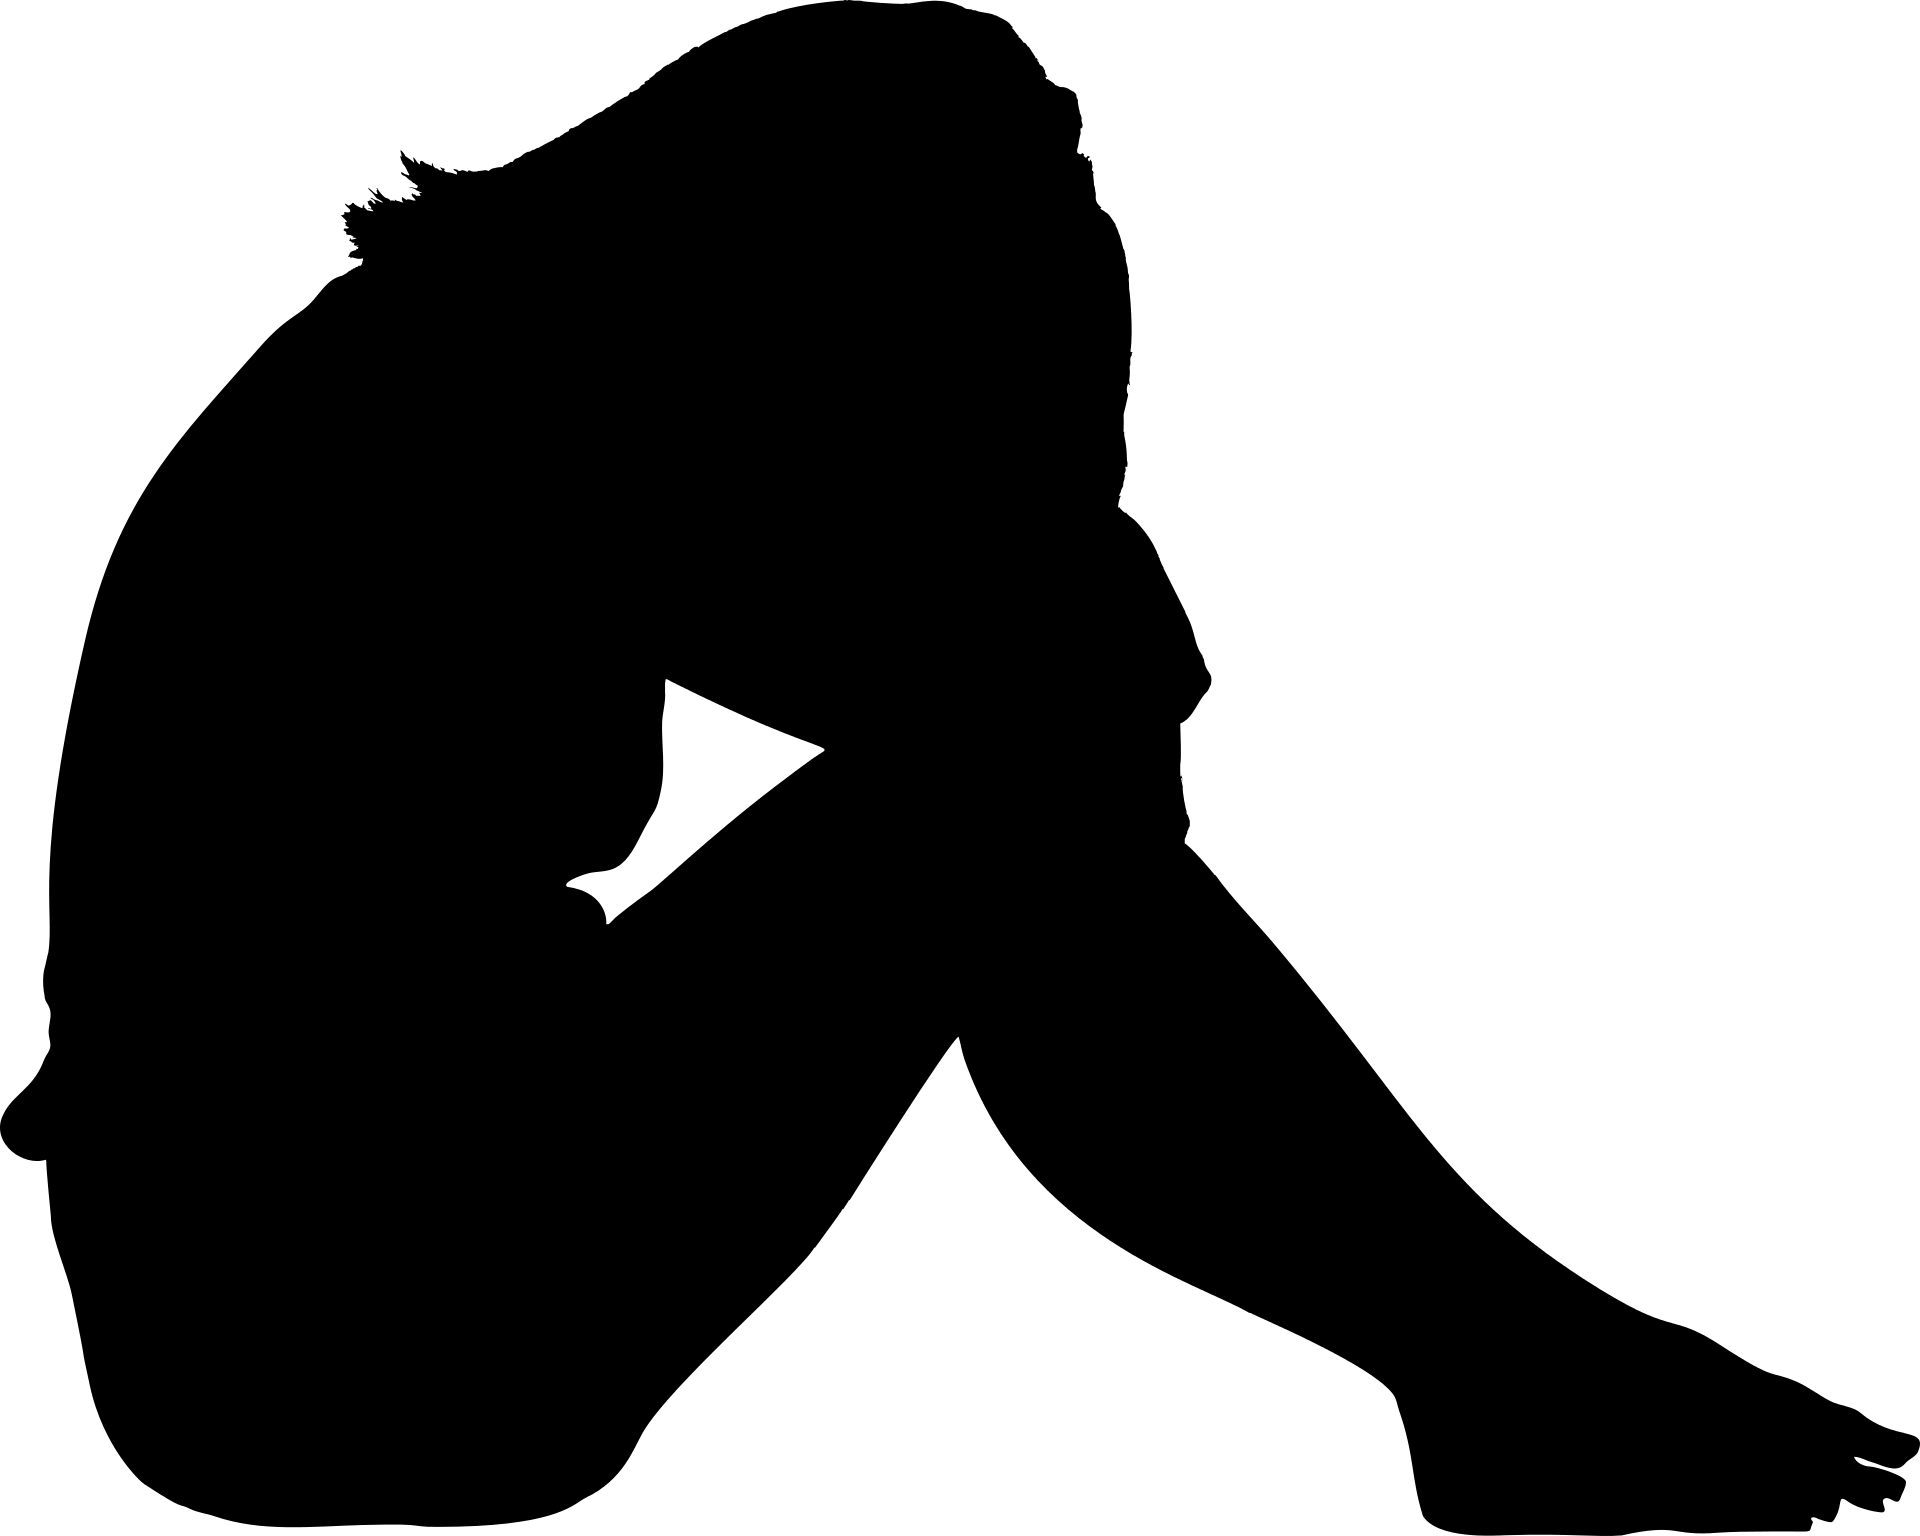 female-1861366.png